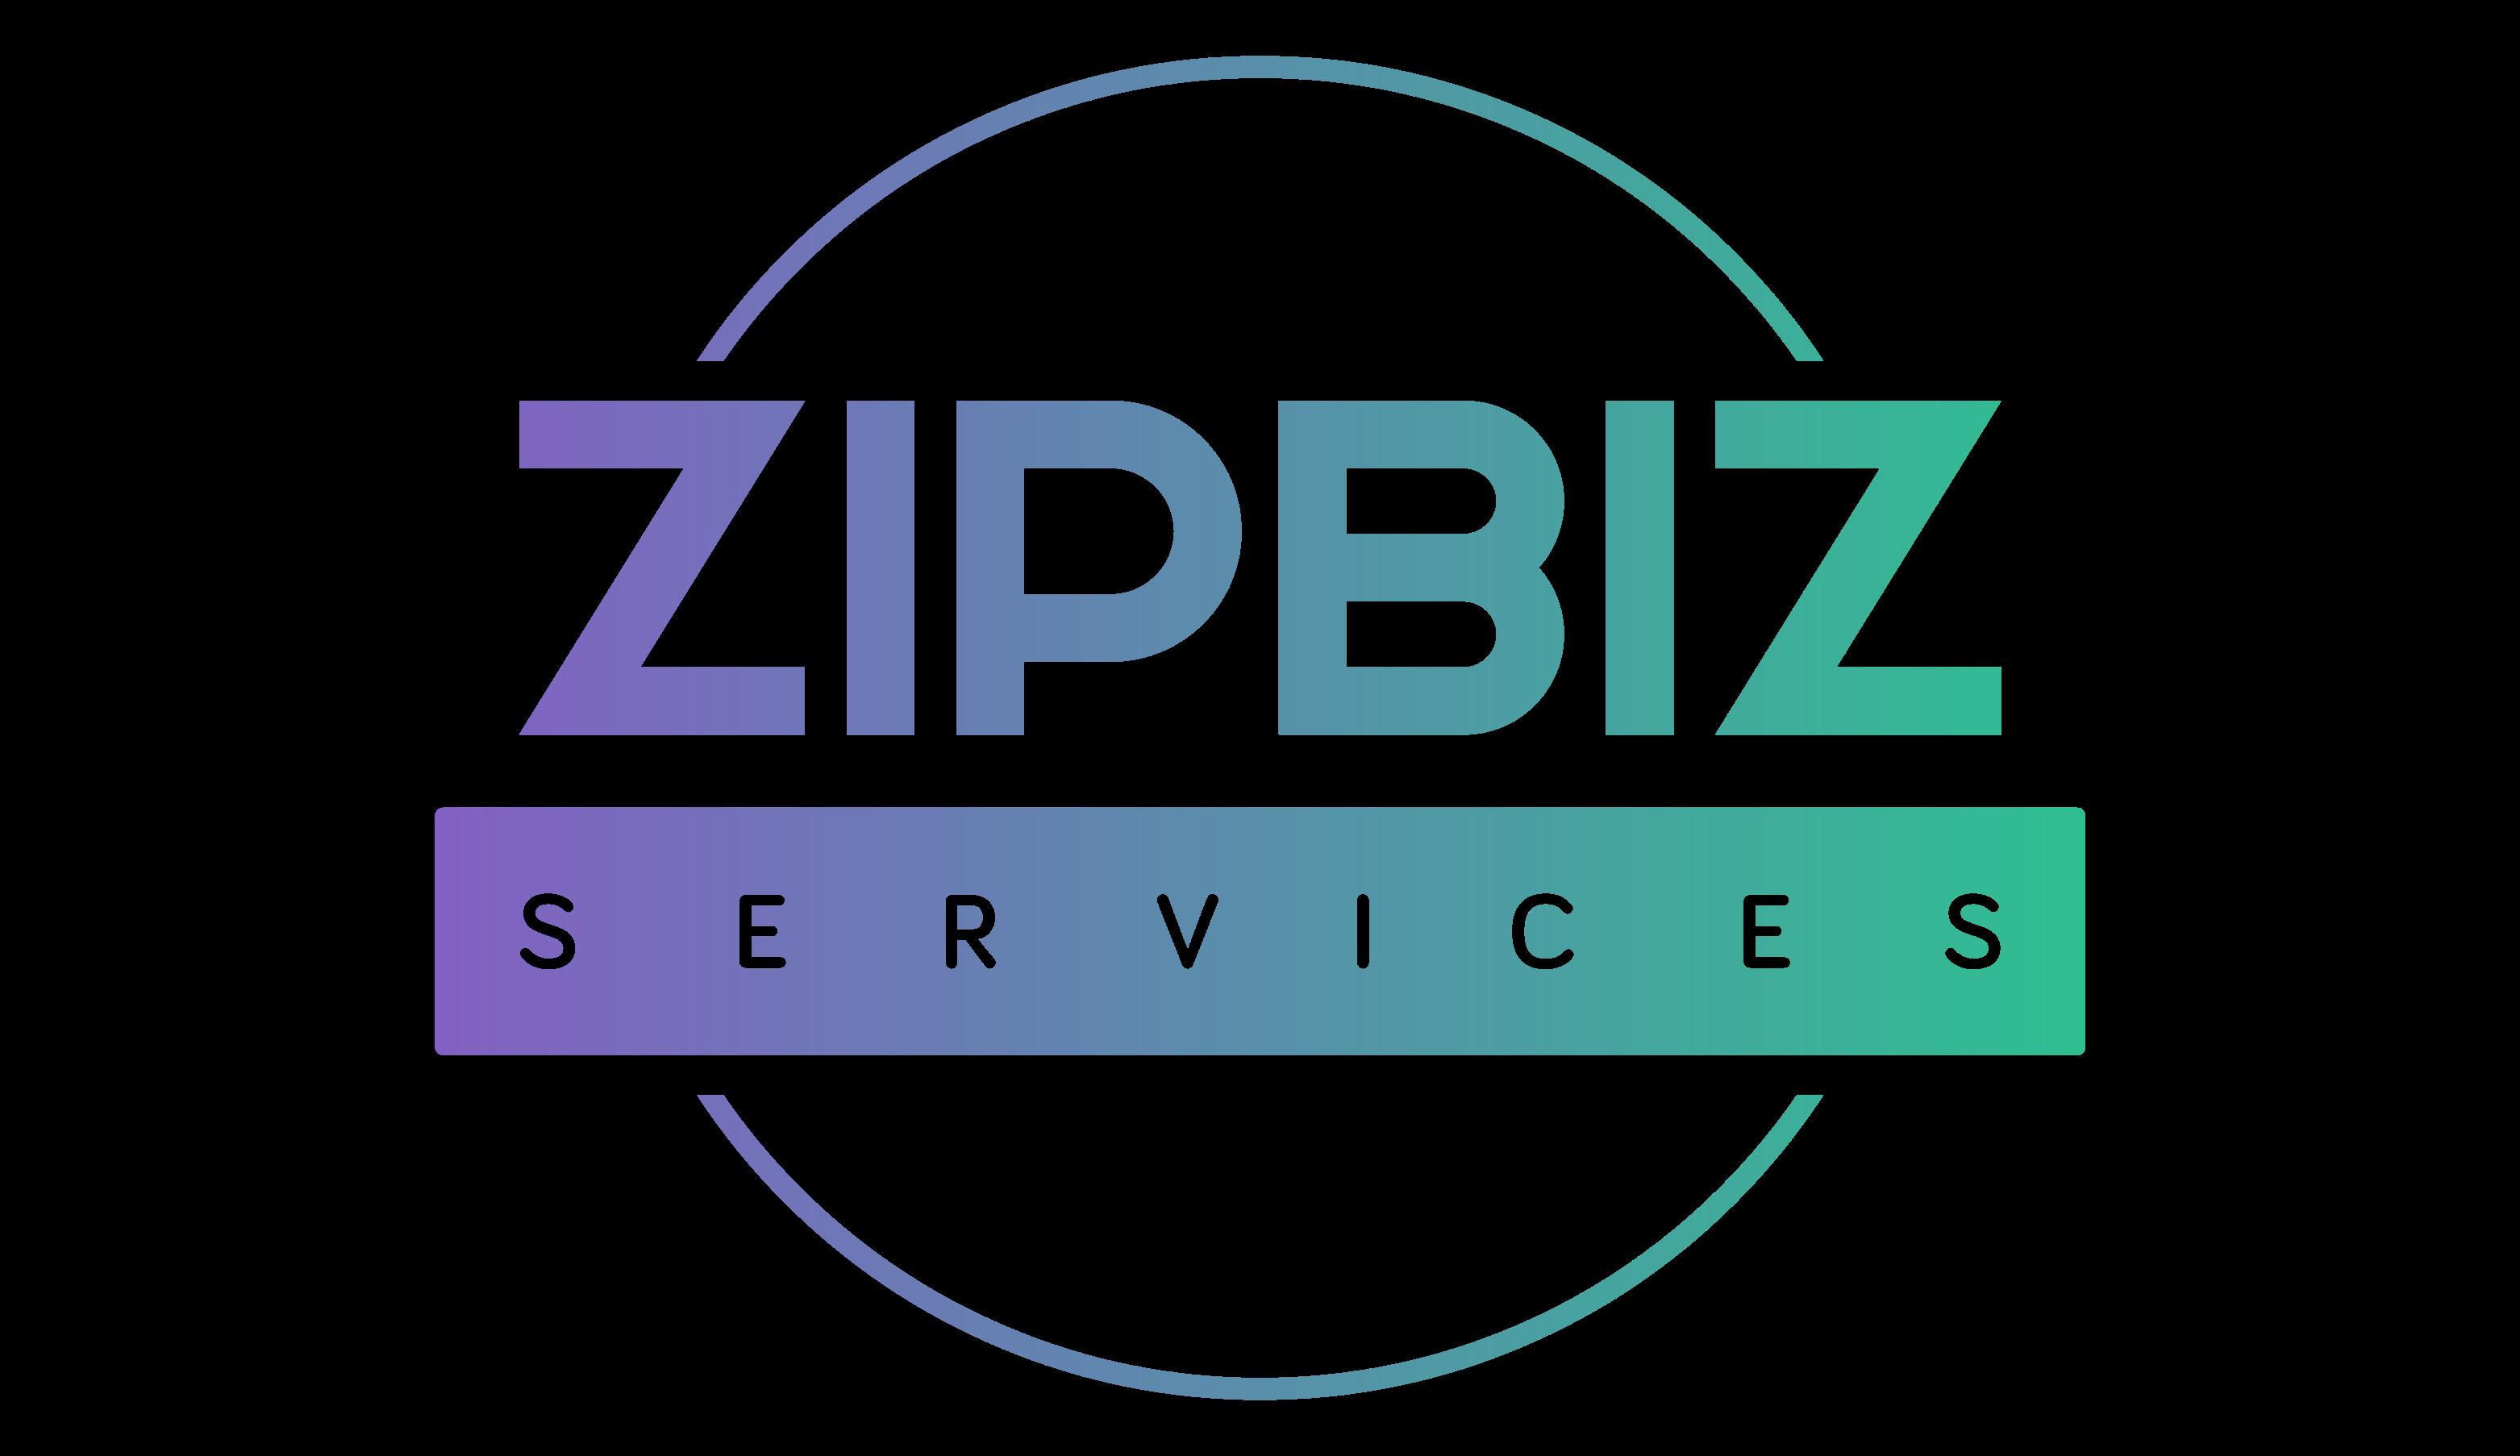 Zip Business Services